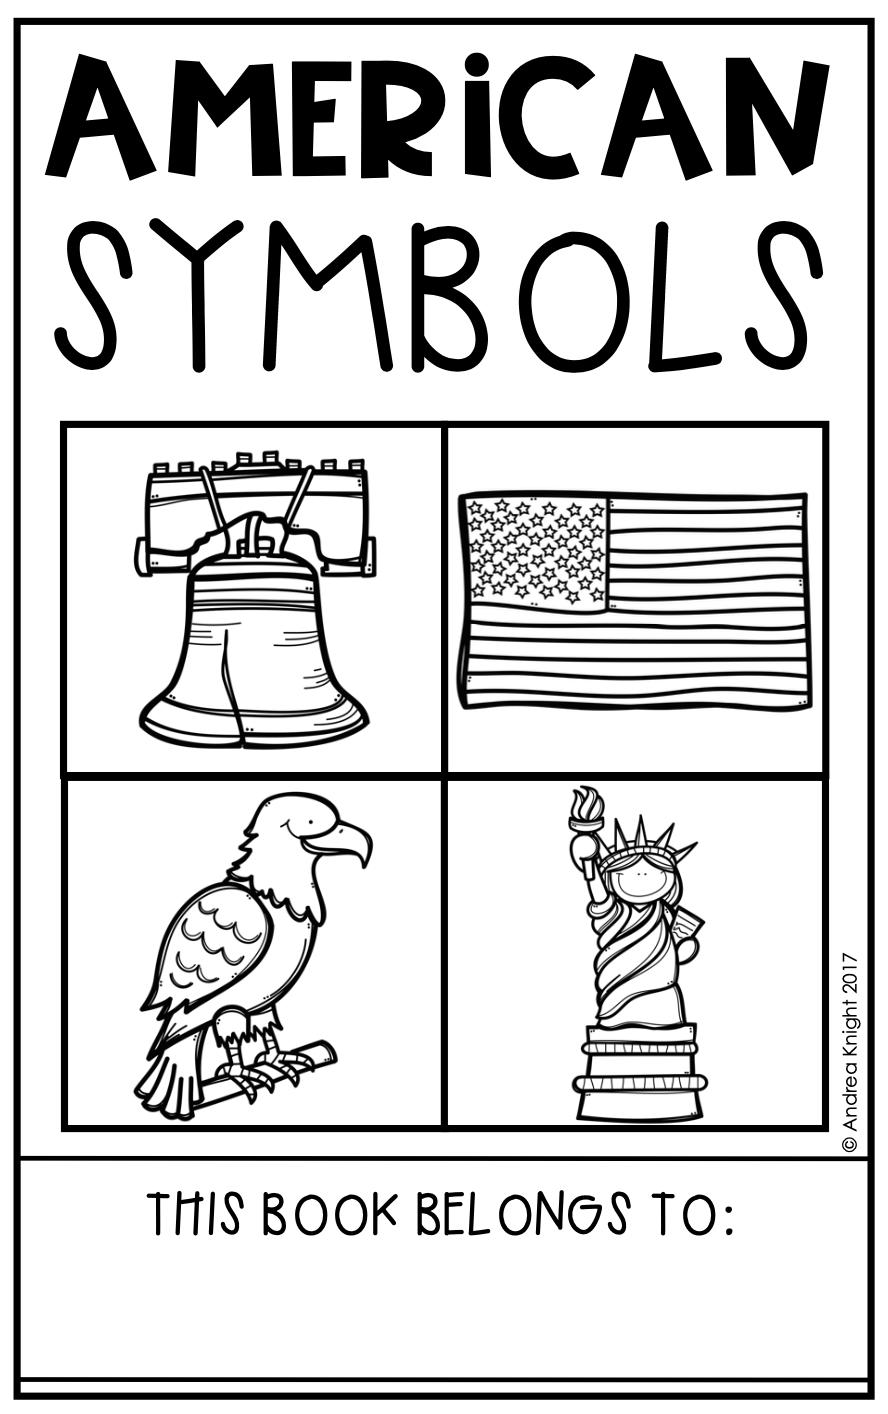 American Symbols Book for Children   American symbols book [ 1414 x 888 Pixel ]